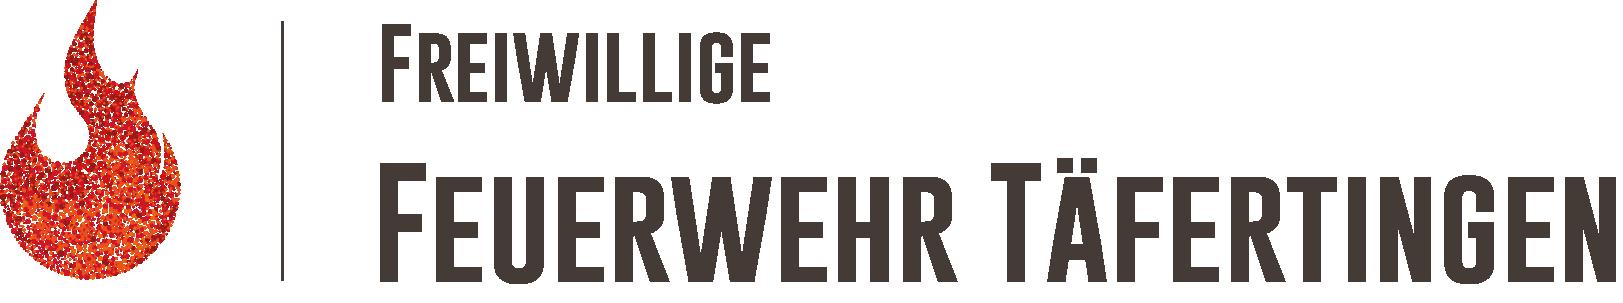 Freiwillige Feuerwehr Täfertingen e.V.